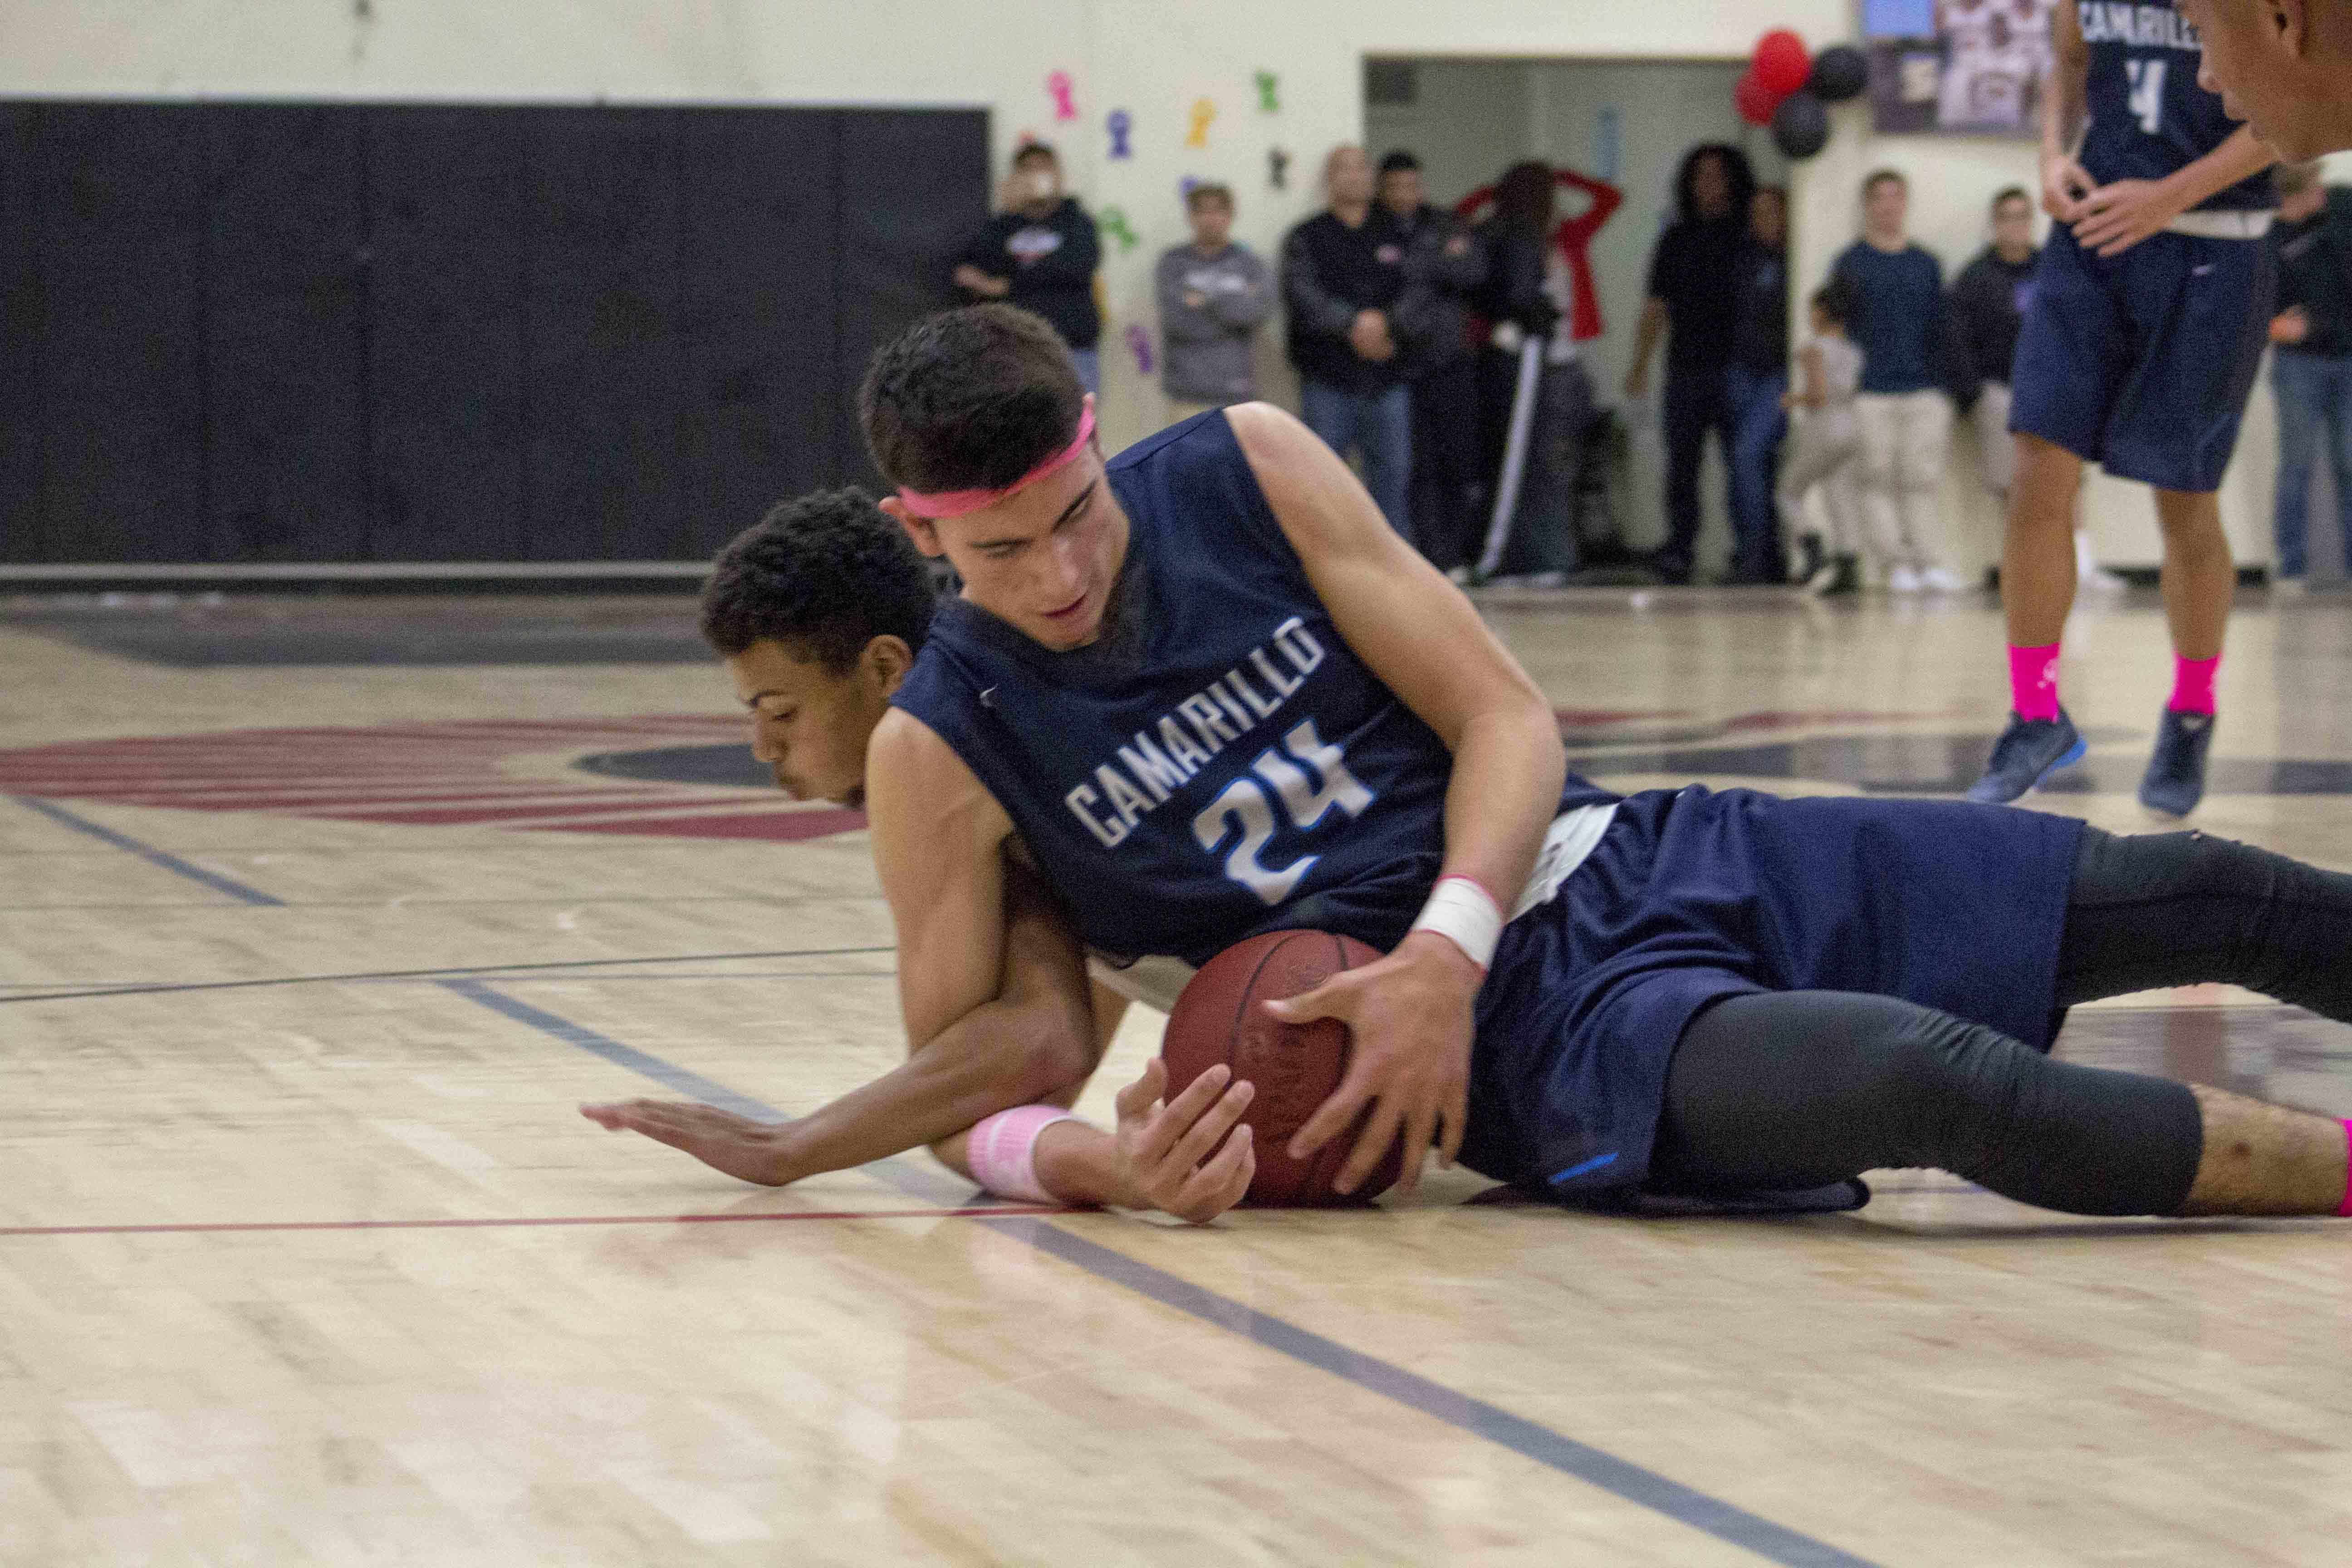 Sophomore Jaime Jaquez Jr. dives for the loose ball.